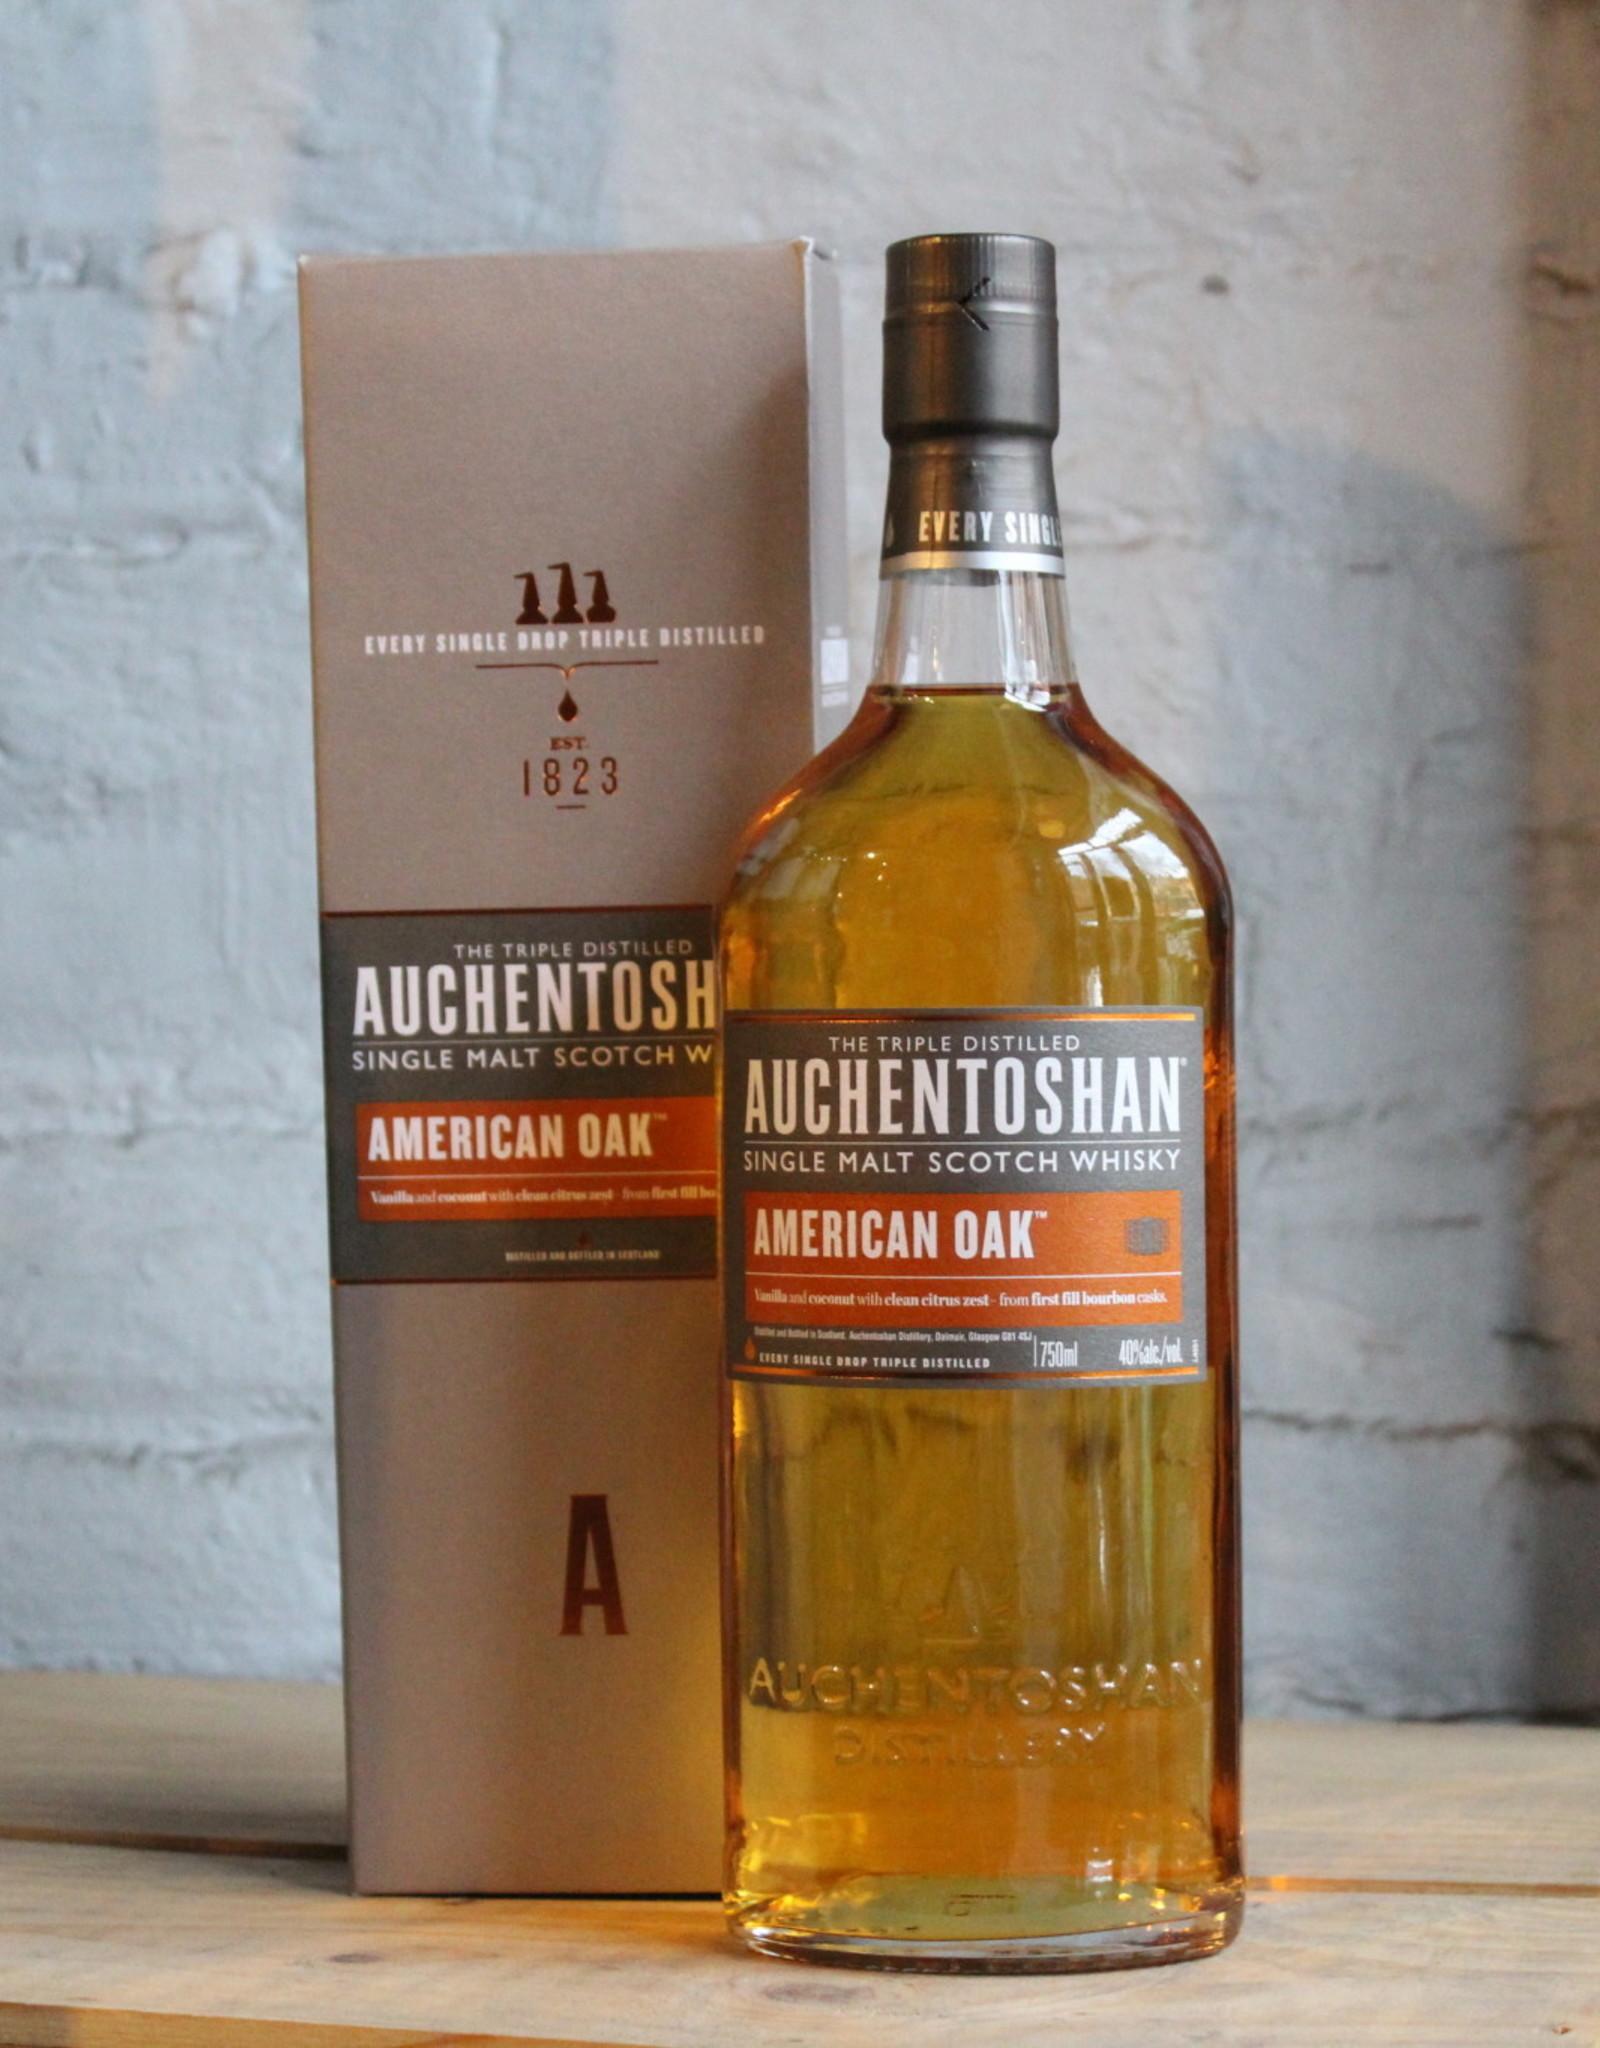 Auchentoshan American Oak Single Malt Scotch - Lowlands, Scotland (750ml)